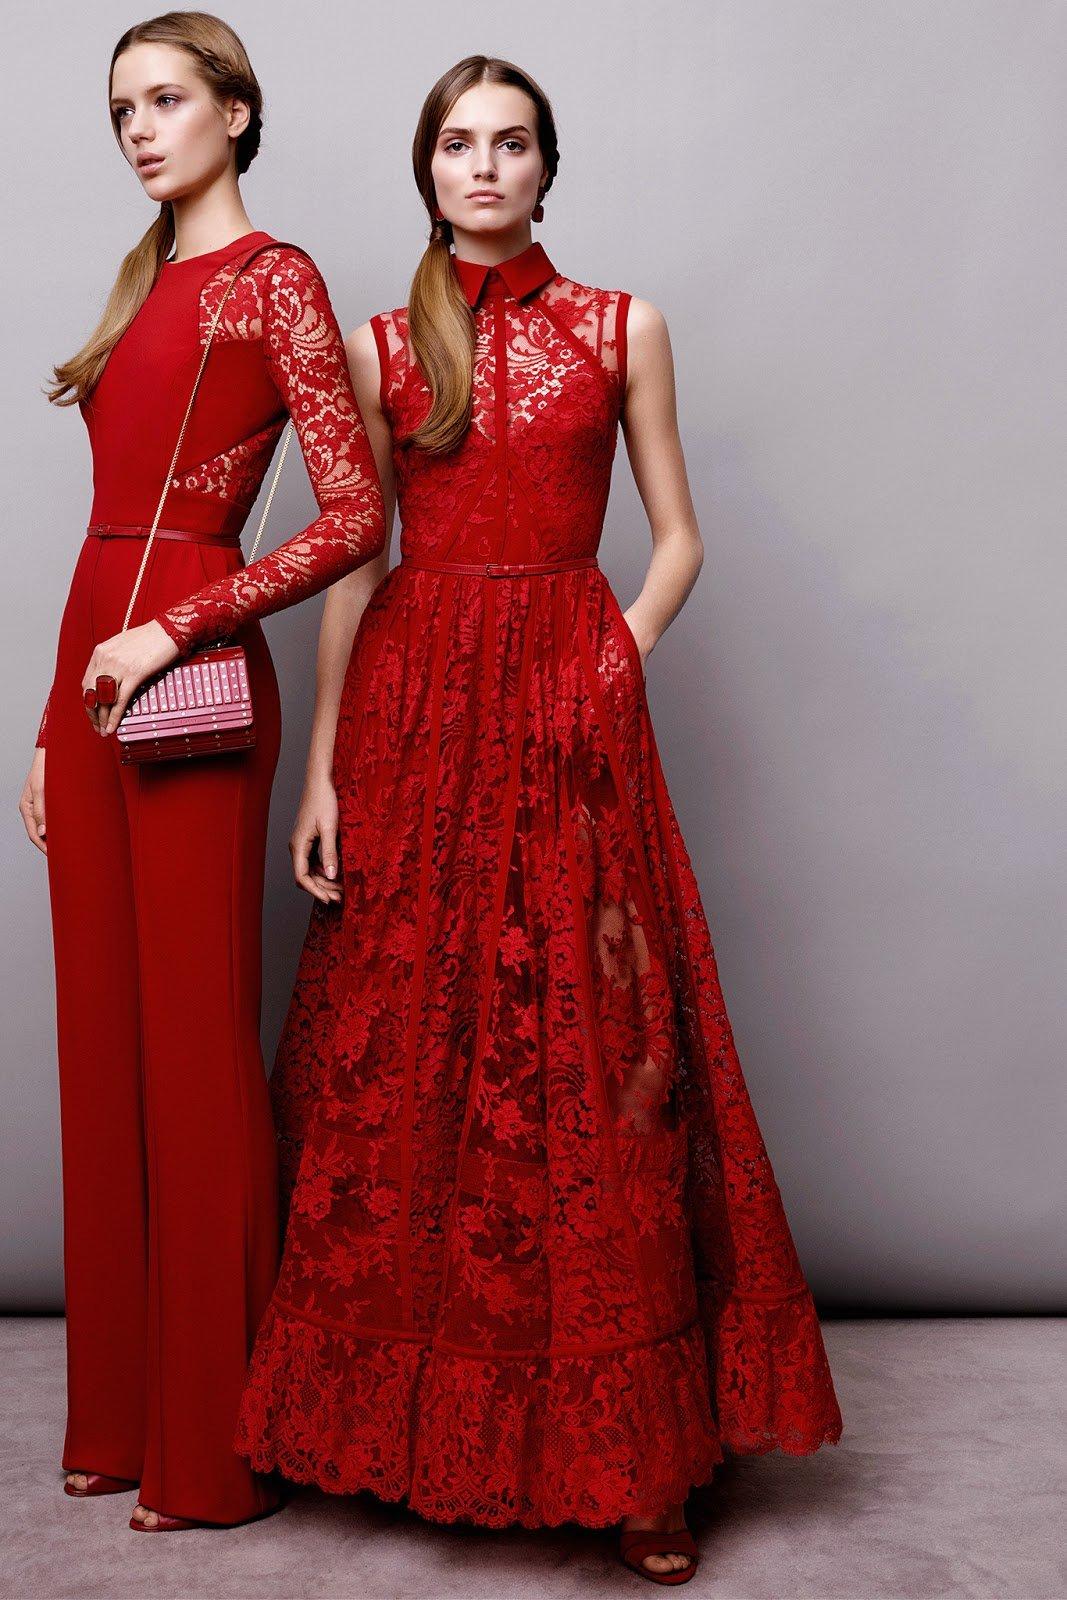 2018 latest fashion dresses Oscars Red Carpet Dresses 2018 POPSUGAR Fashion